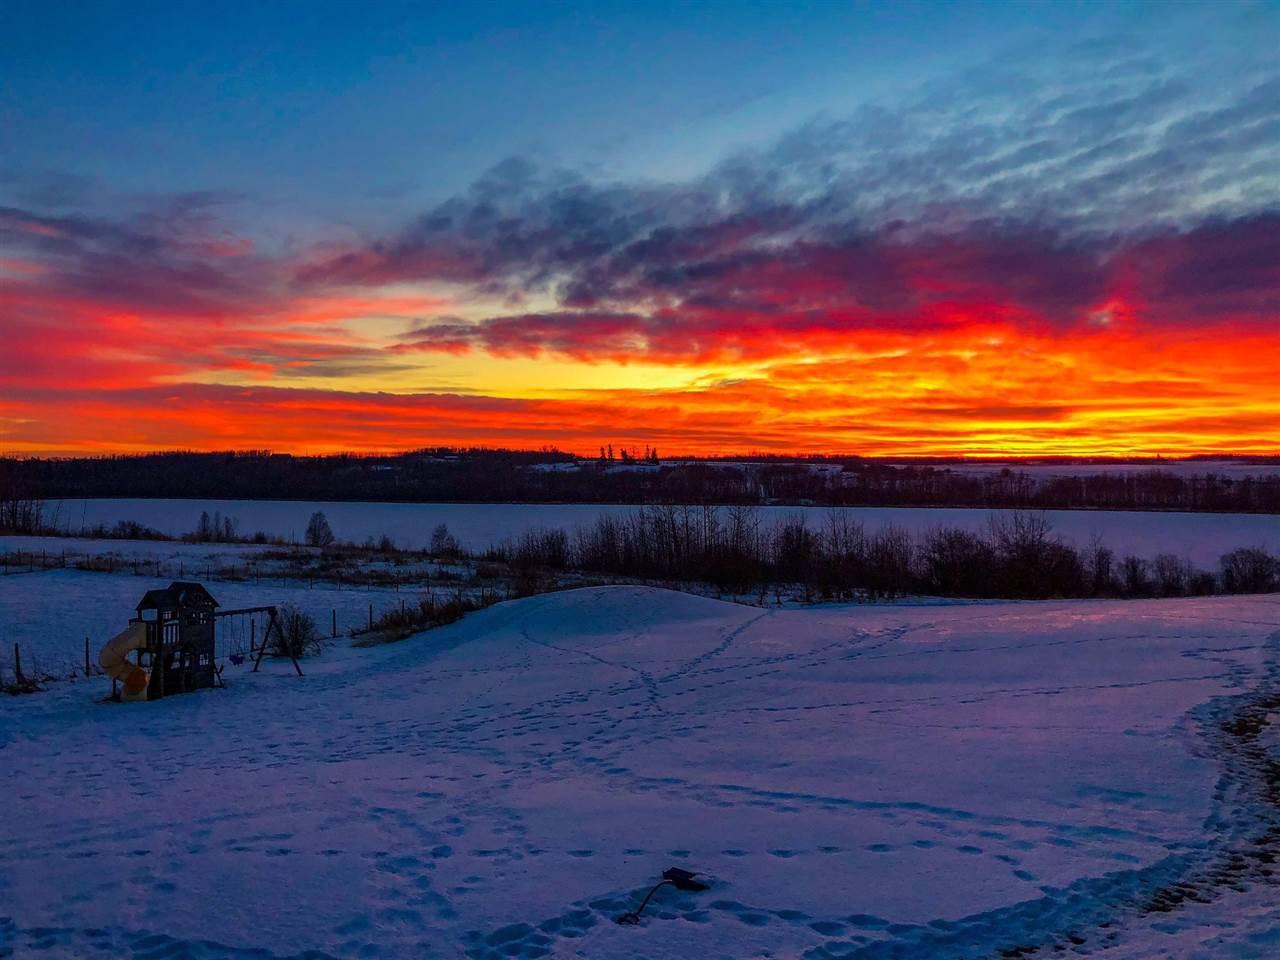 Main Photo: 50 LANDING Drive: Rural Sturgeon County House for sale : MLS®# E4223165